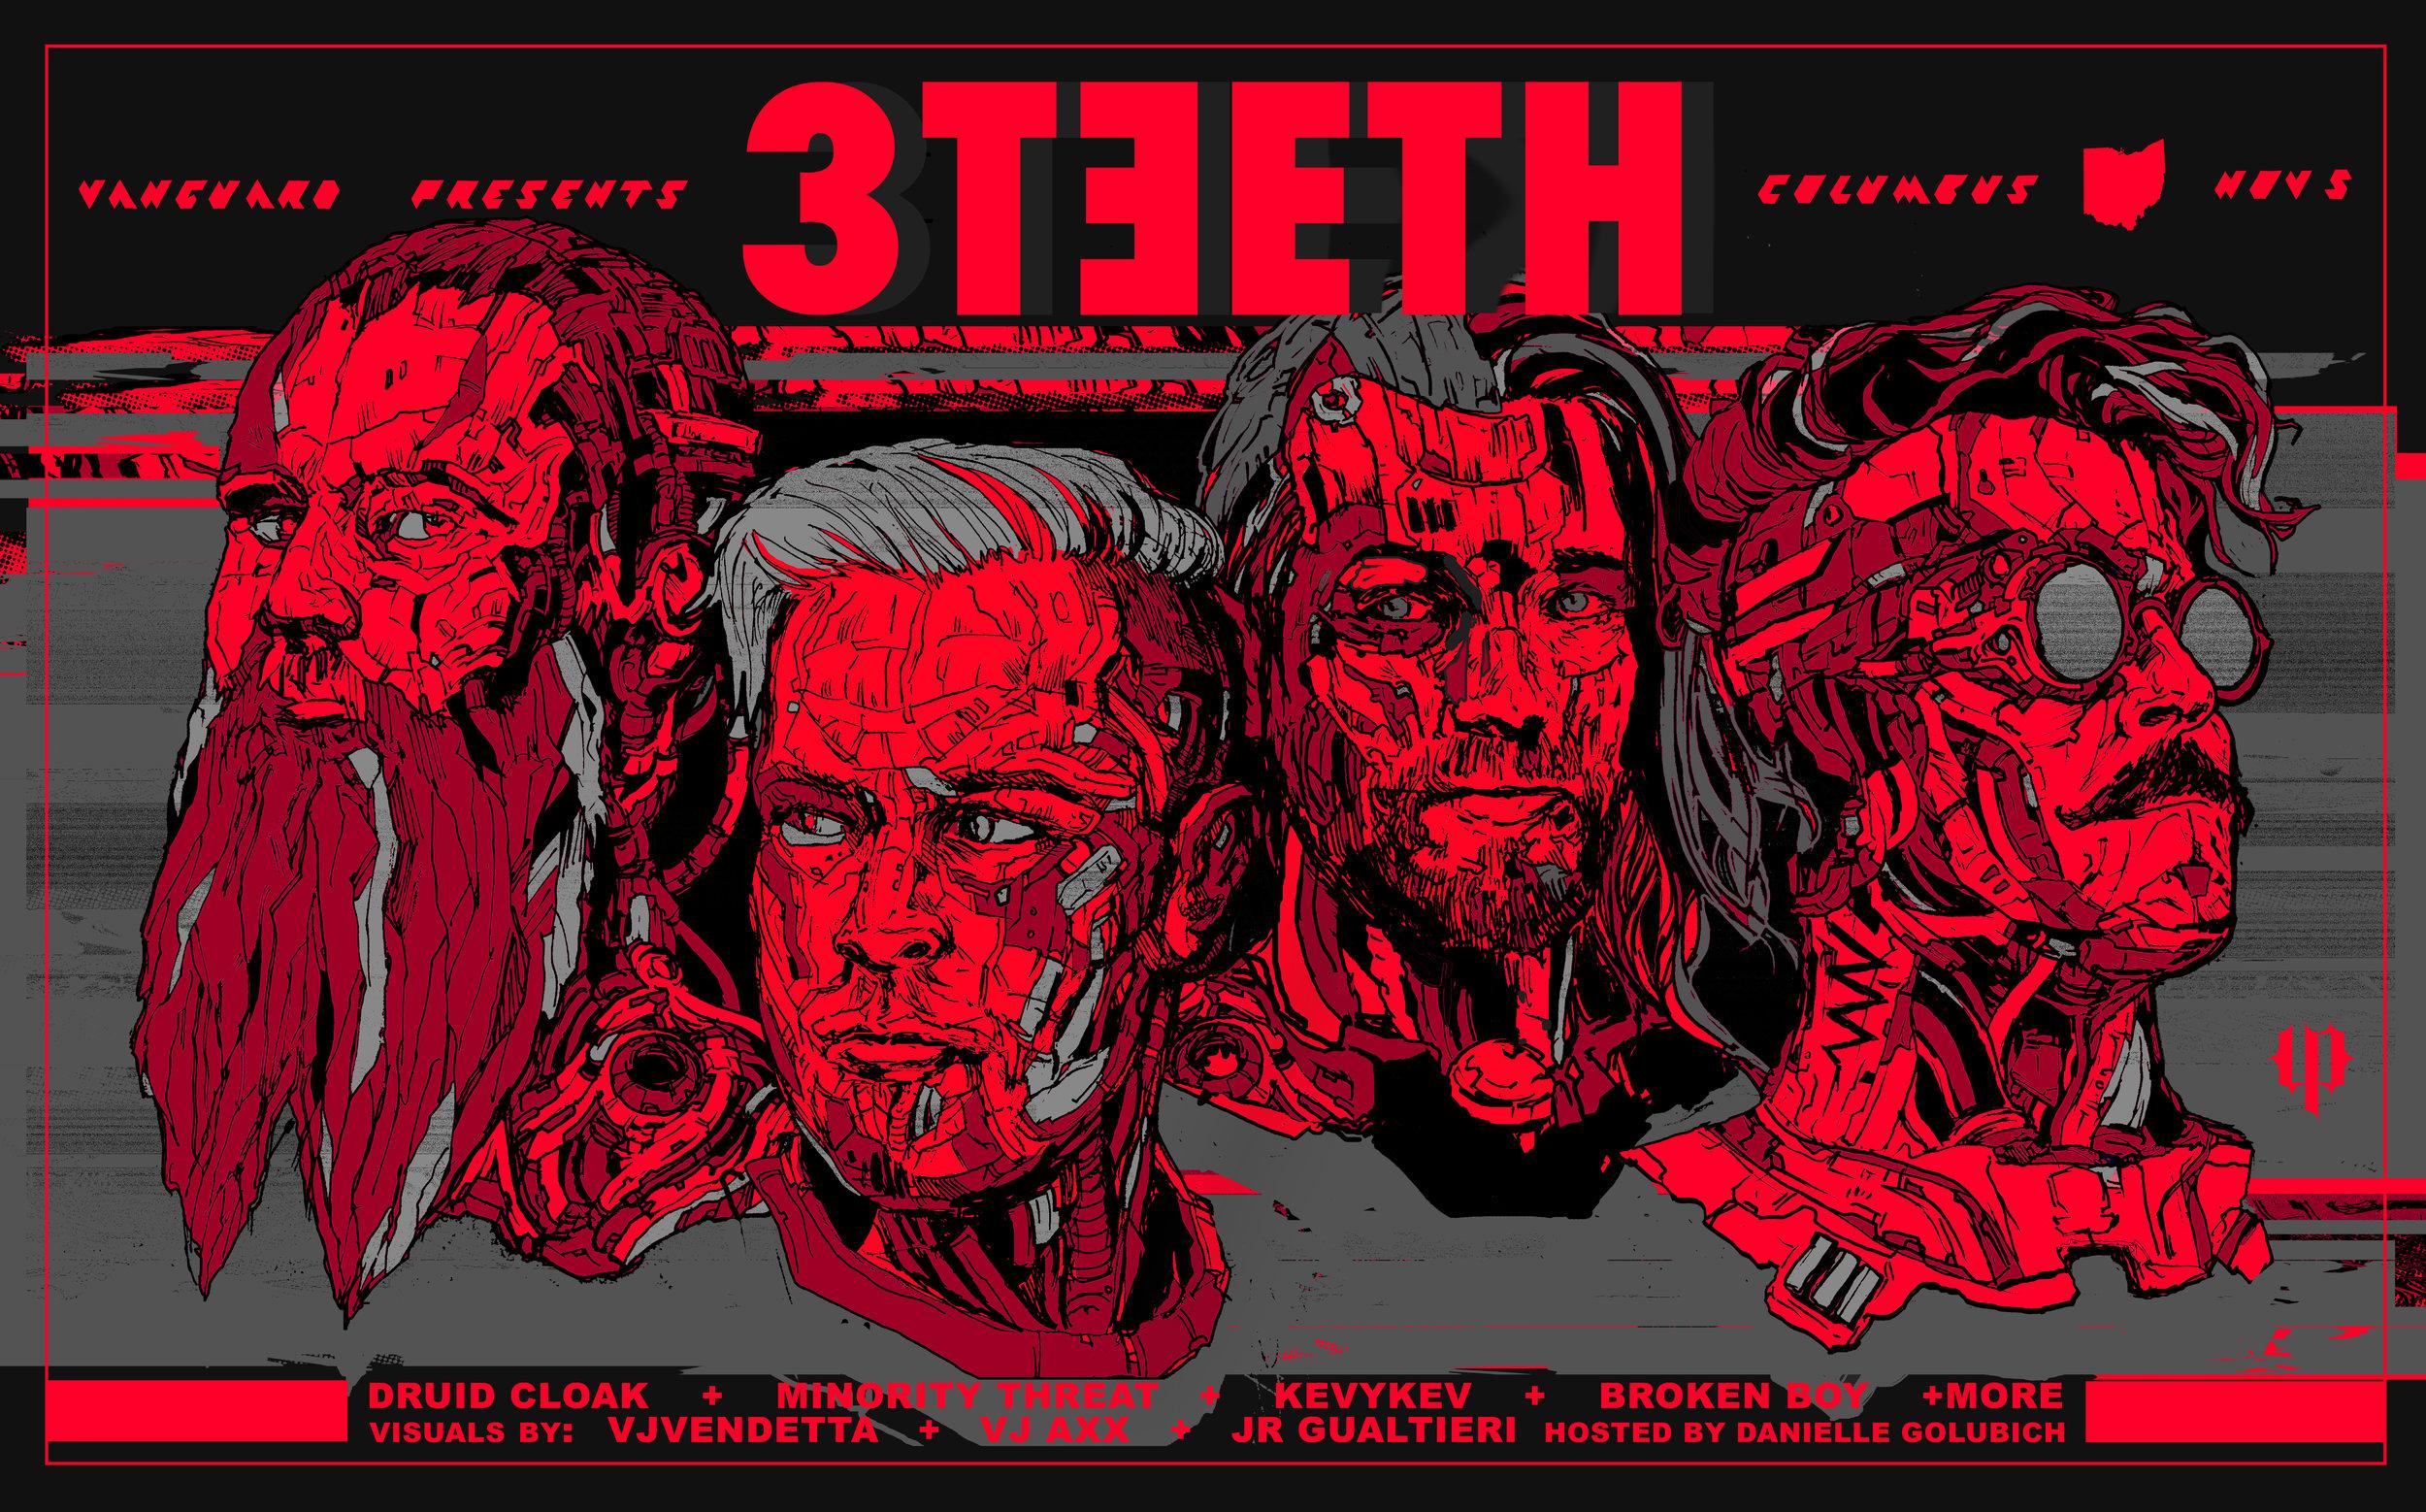 3TEETH cbus poster.jpg